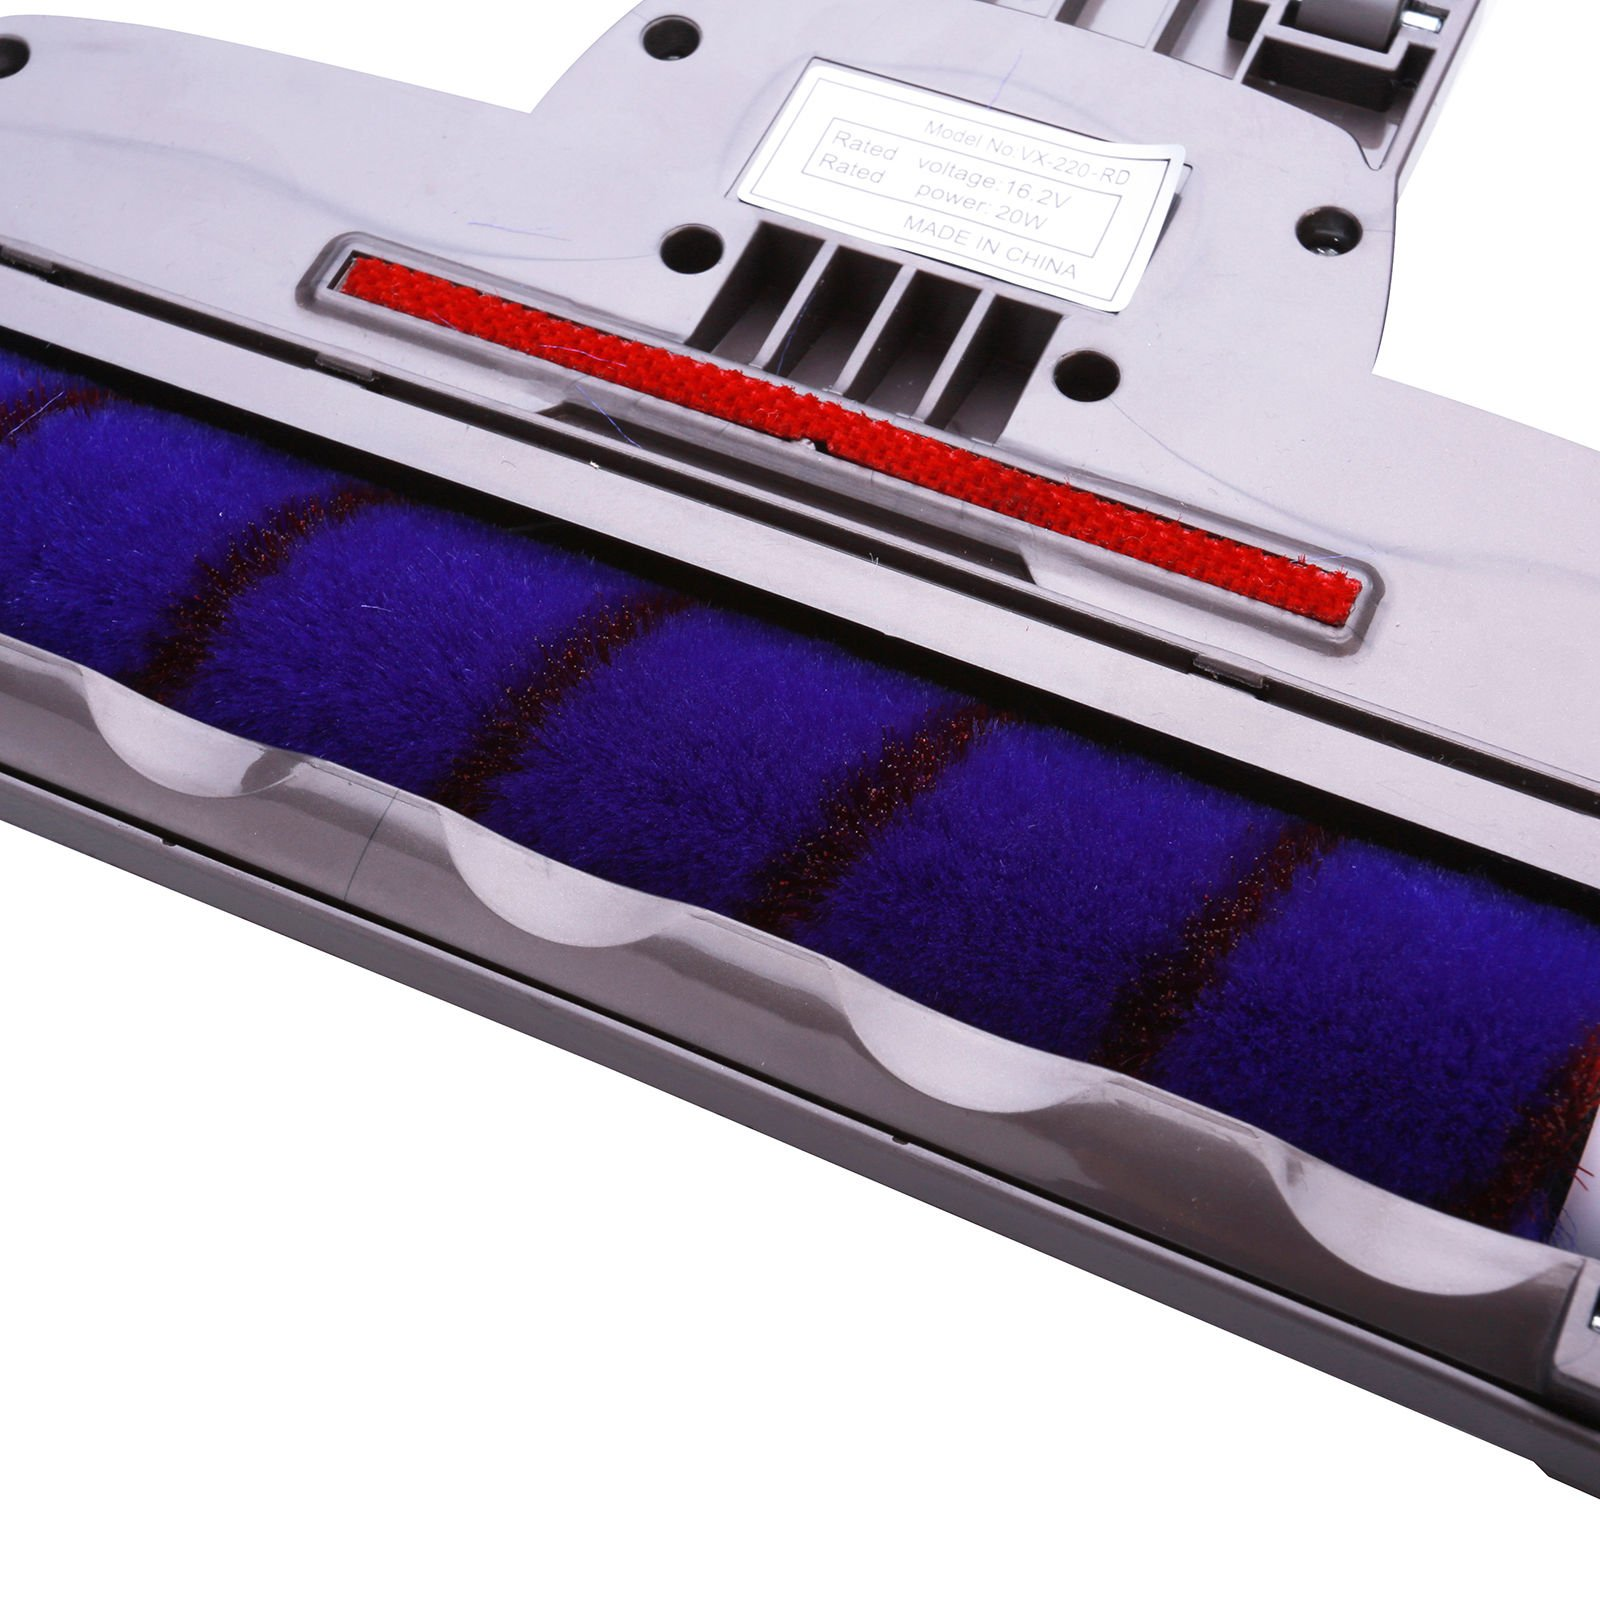 Qualtex Animal Cordless Soft Roller Brush Roll for Dyson V6 by Qualtex (Image #2)